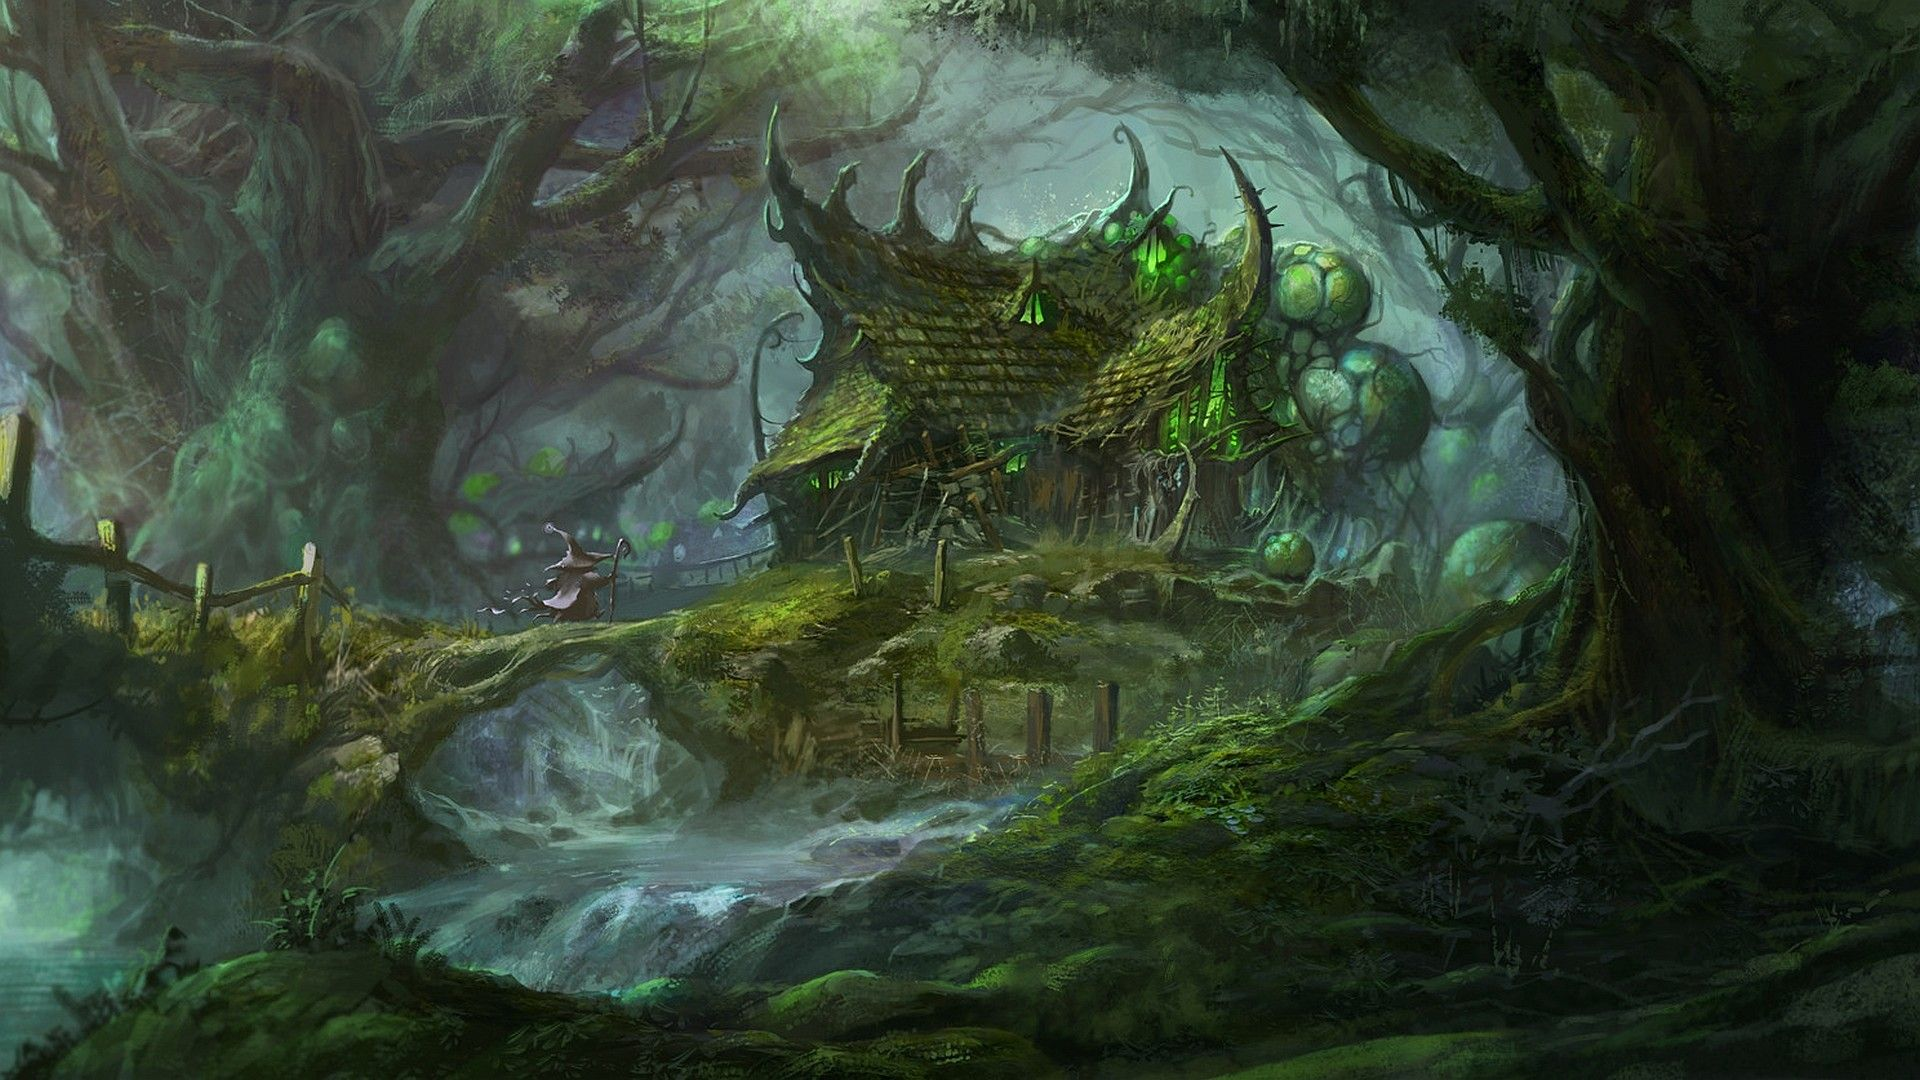 1920x1080 Fantasy Forest Wallpaper Fantasy Forest Forest Art Fantasy Pictures